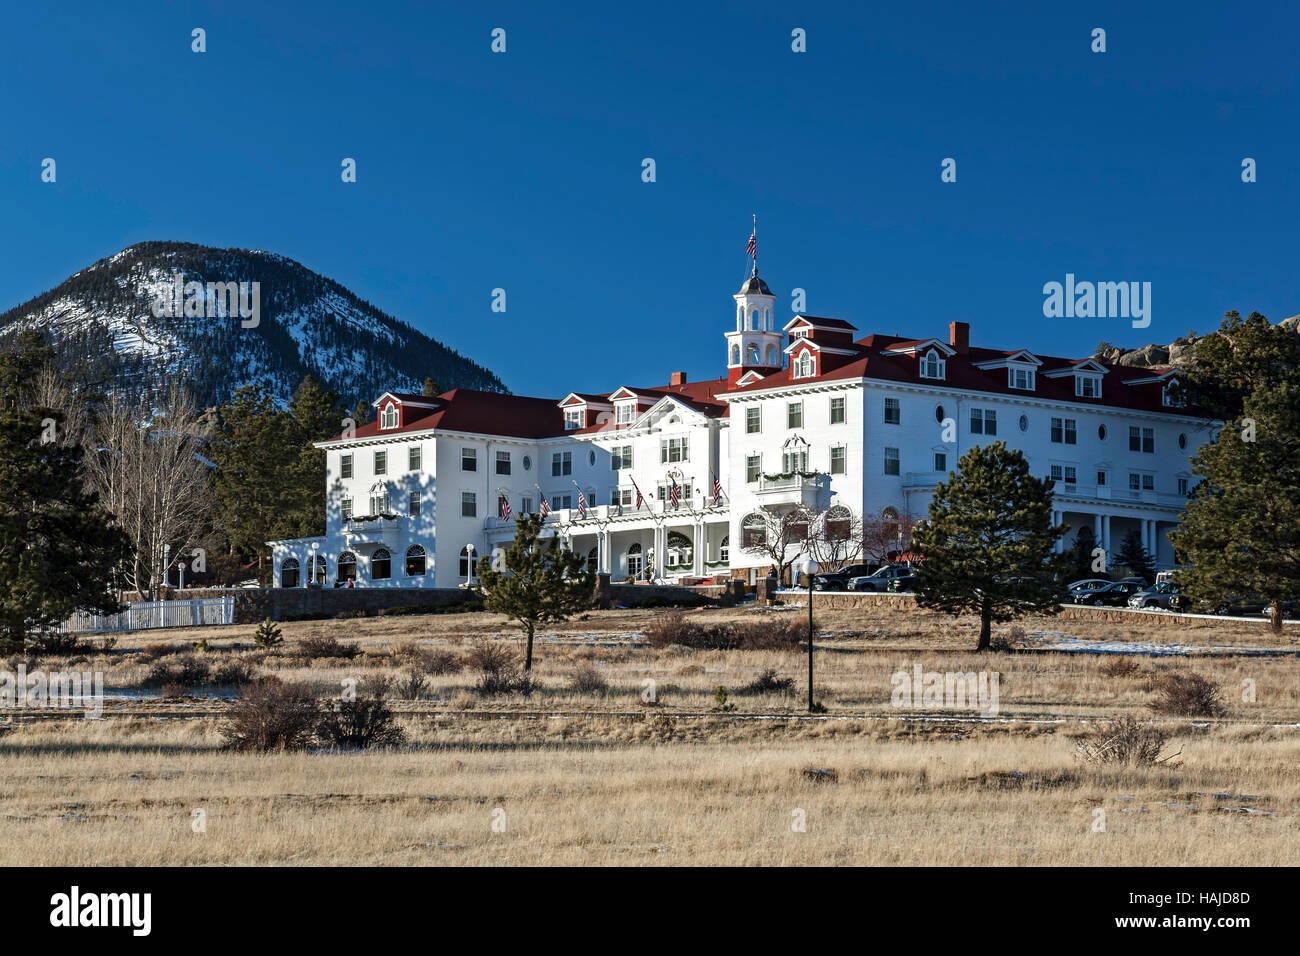 The Stanley Hotel, Estes Park, Colorado USA - Stock Image